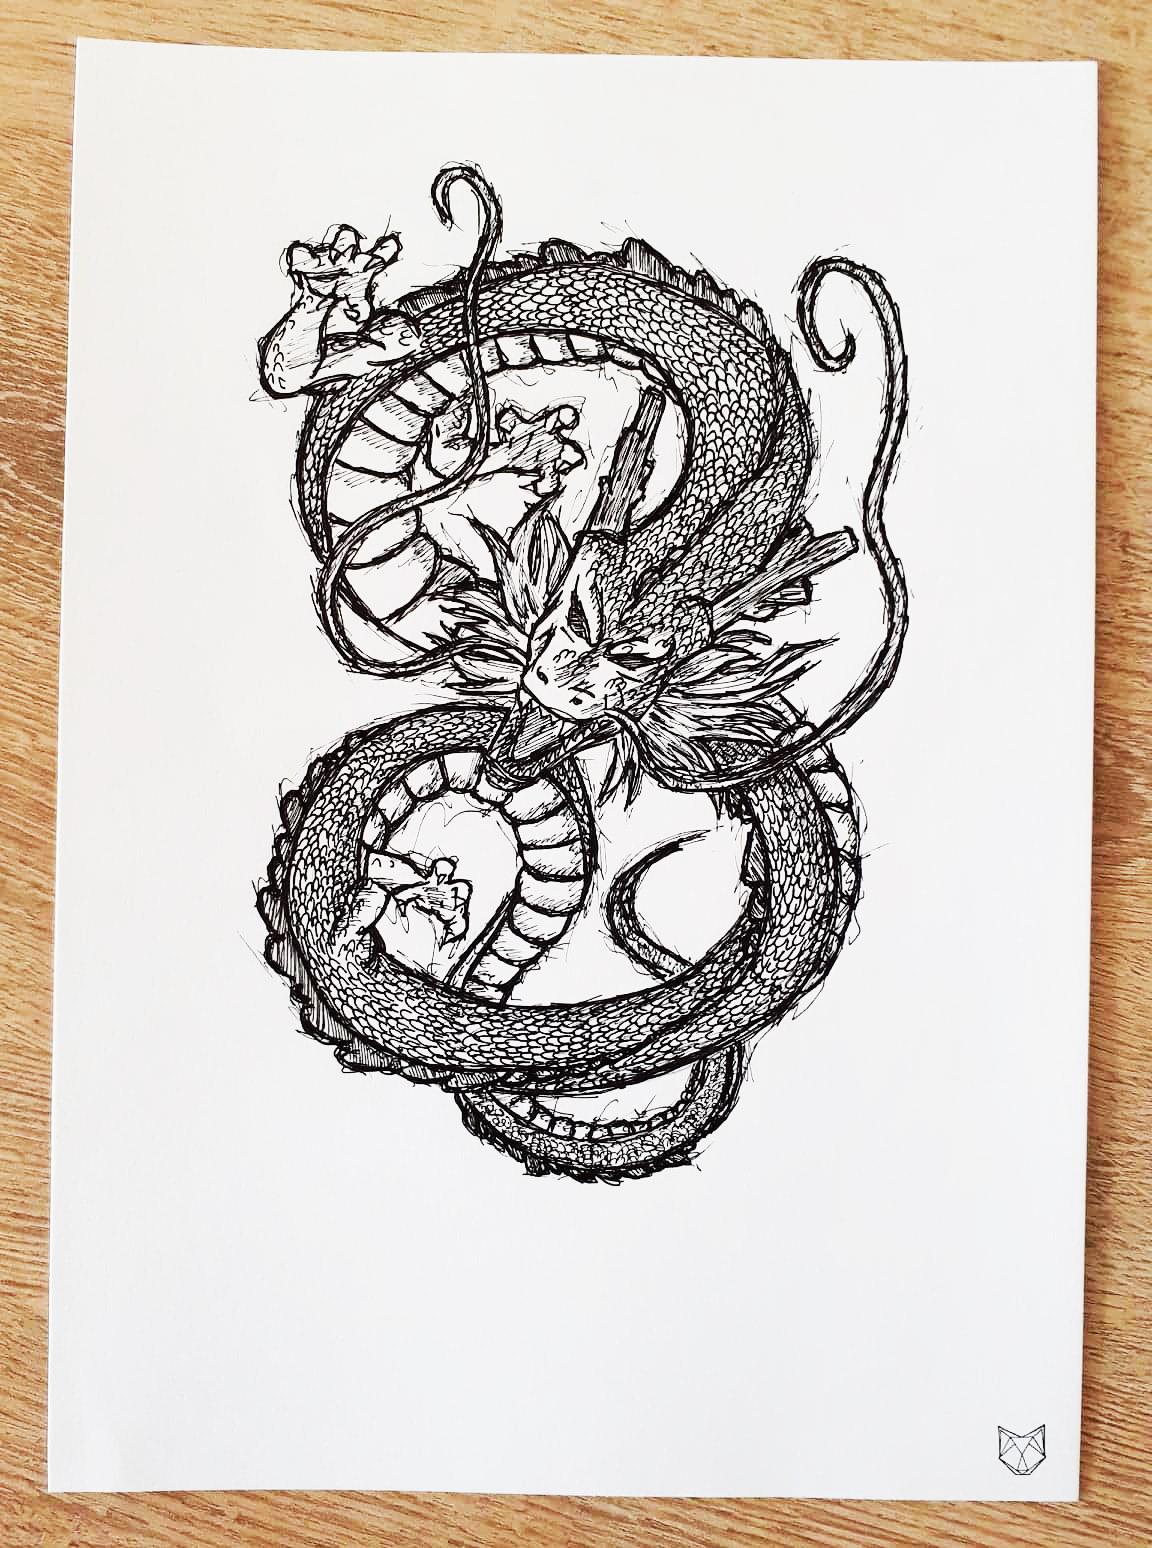 Dessin Manga Shenron Dragon Ball Art Peintures Par Shad